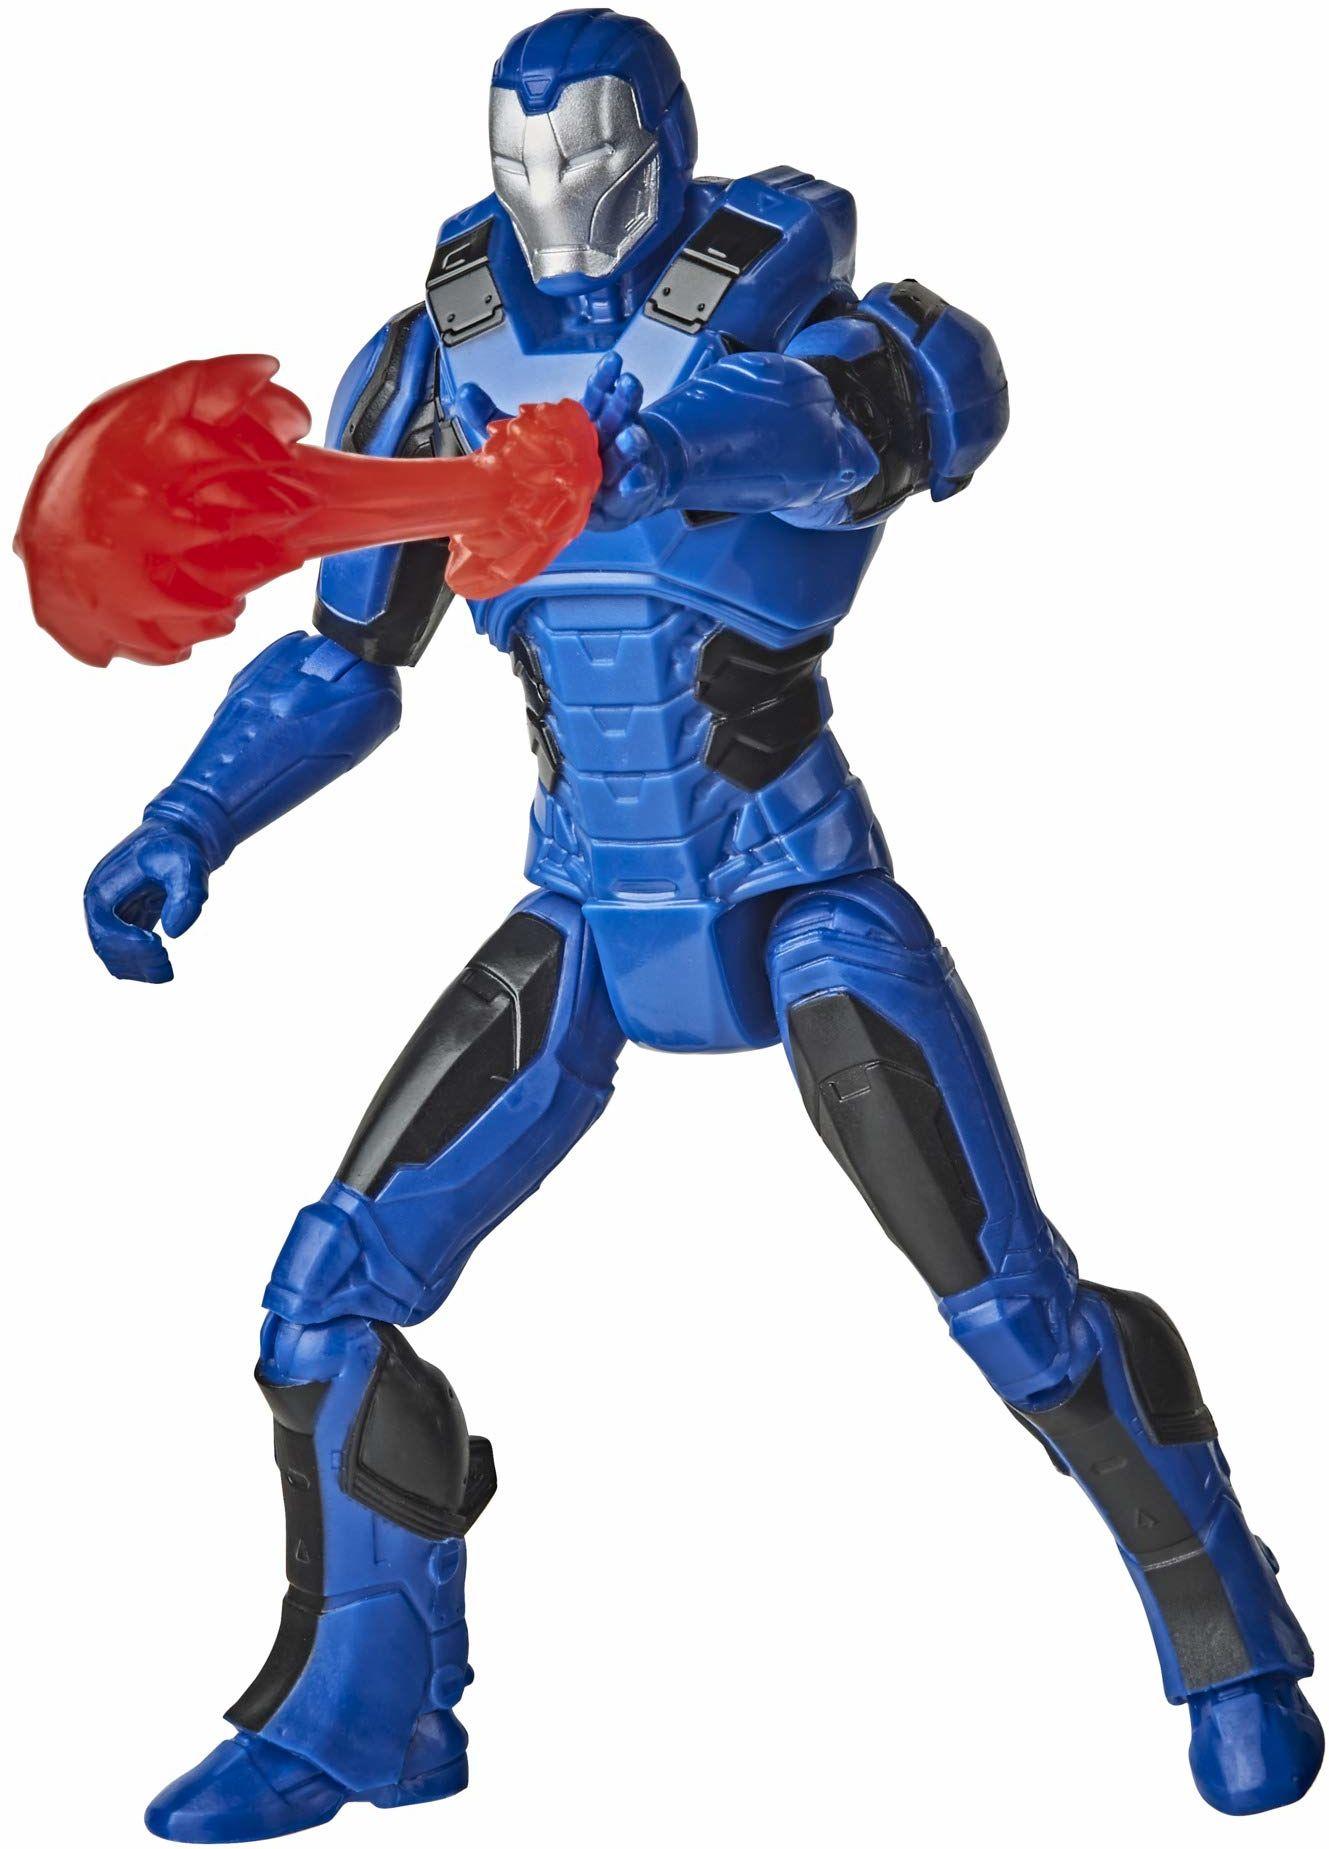 Hasbro Marvel Gamerverse 15 cm Iron Man figurka zabawka, z nastrojową skórą pancerną, od 4 roku życia